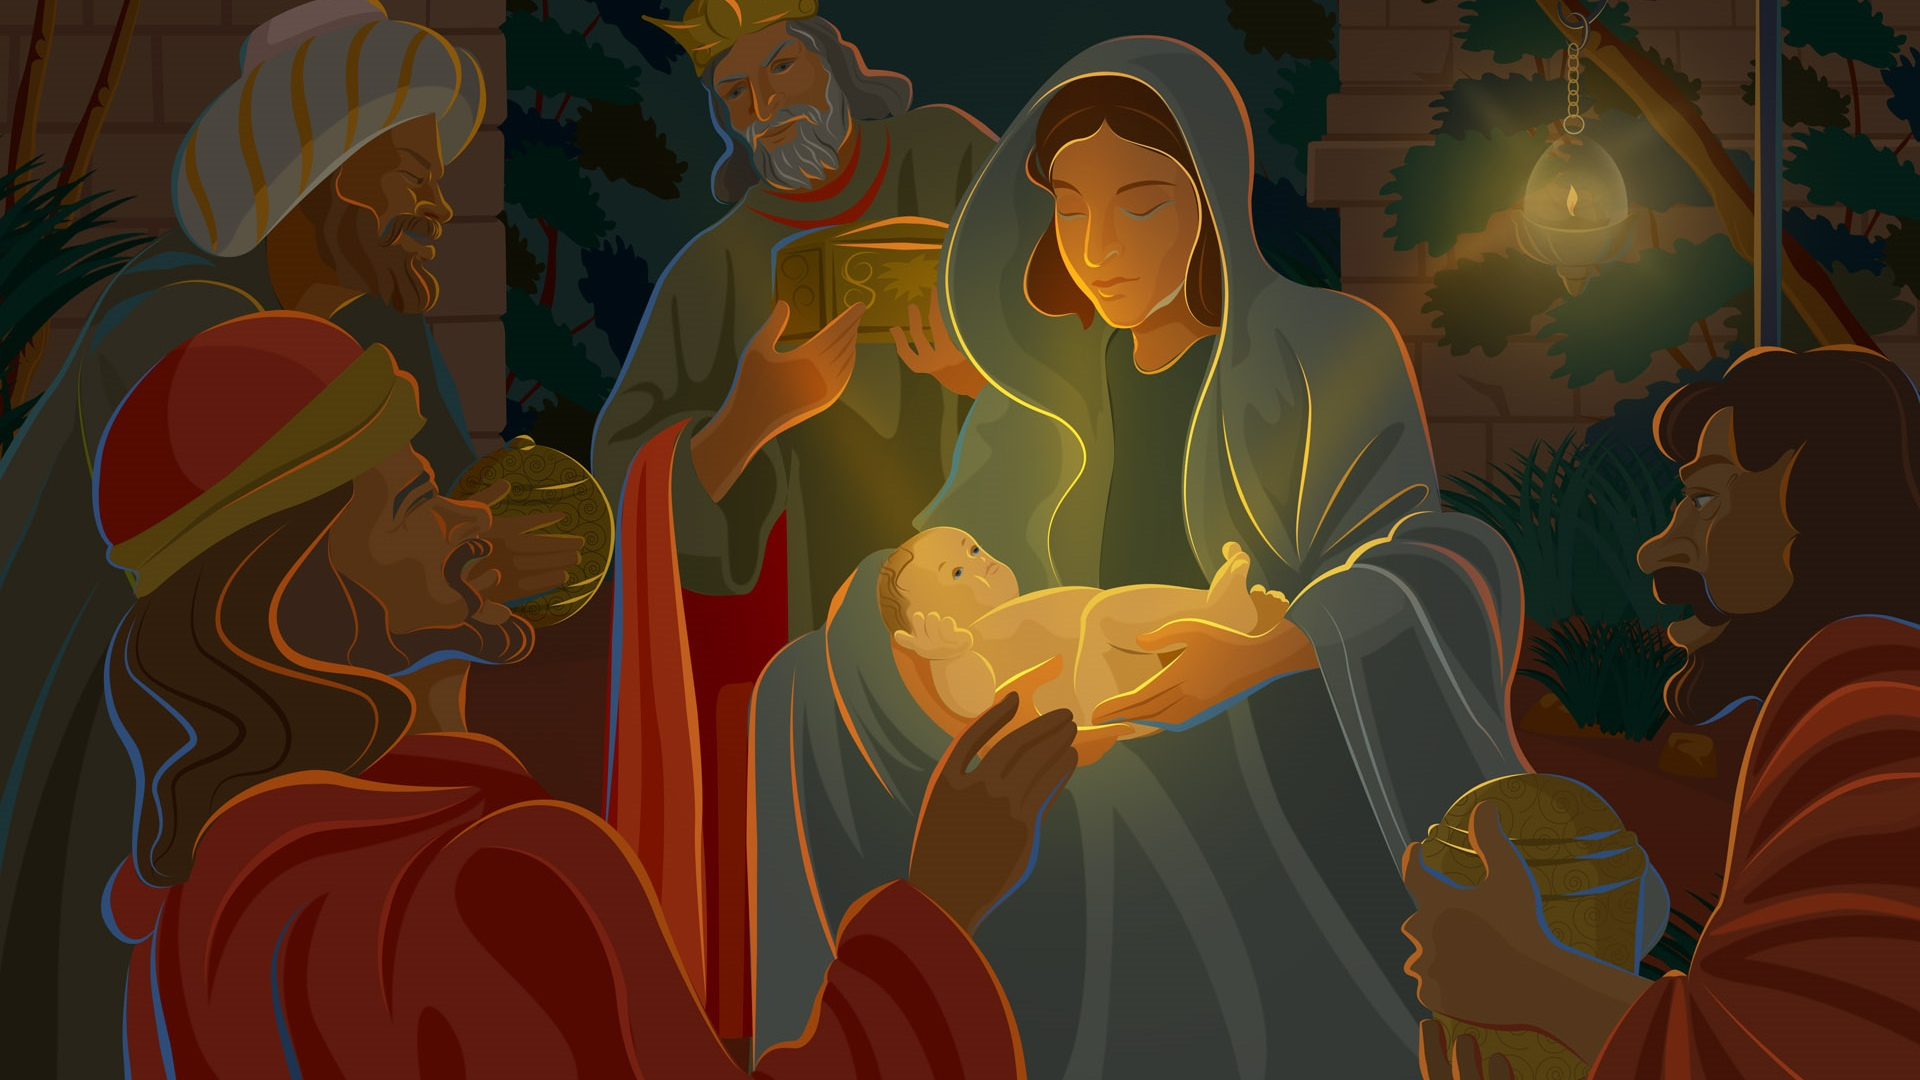 Cute Baby Boy Full Hd Wallpaper Cartoon Baby Jesus Christmas